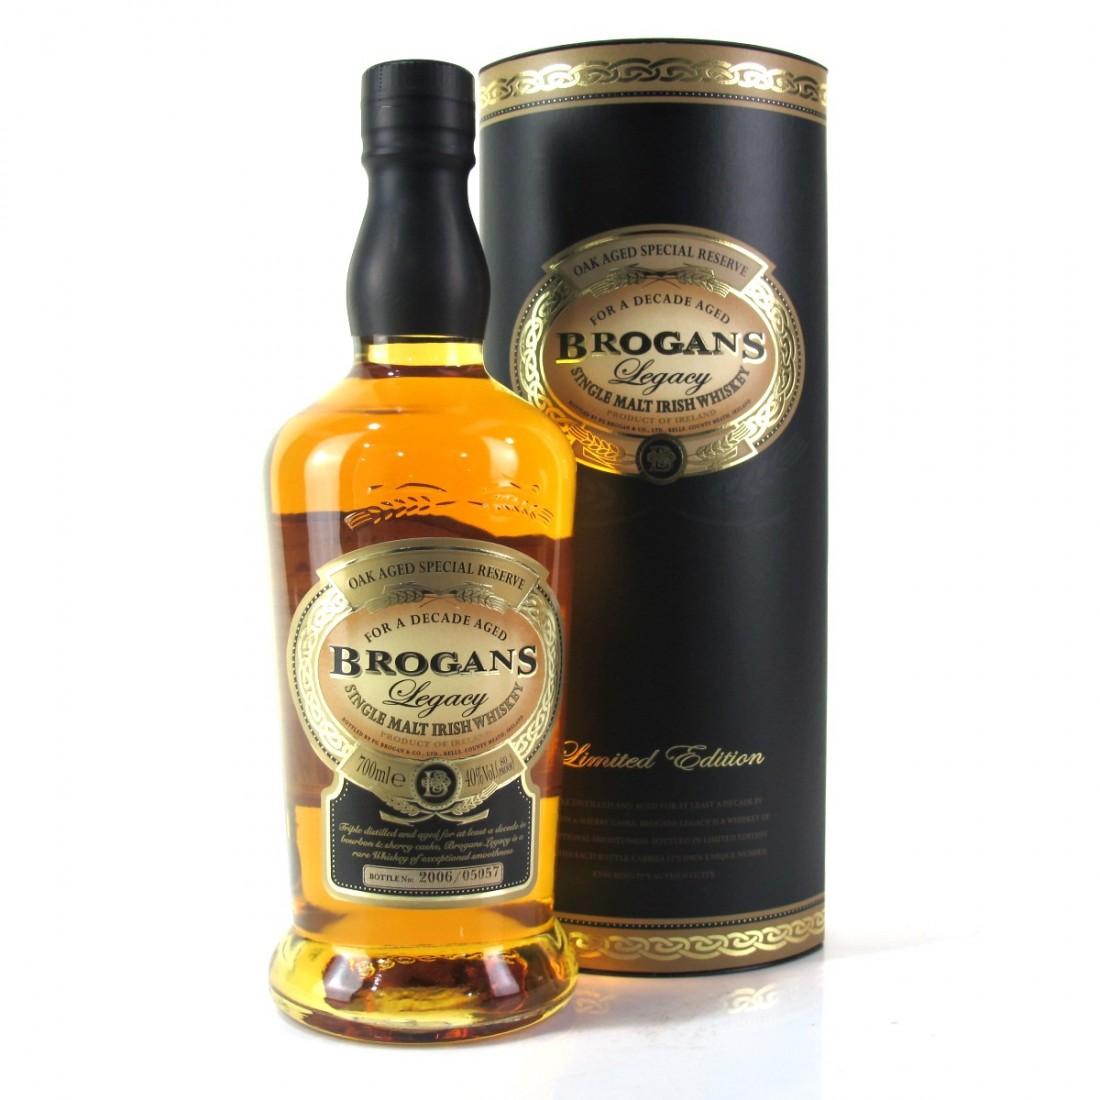 Brogans Legacy 10 Year Old Irish Single Malt